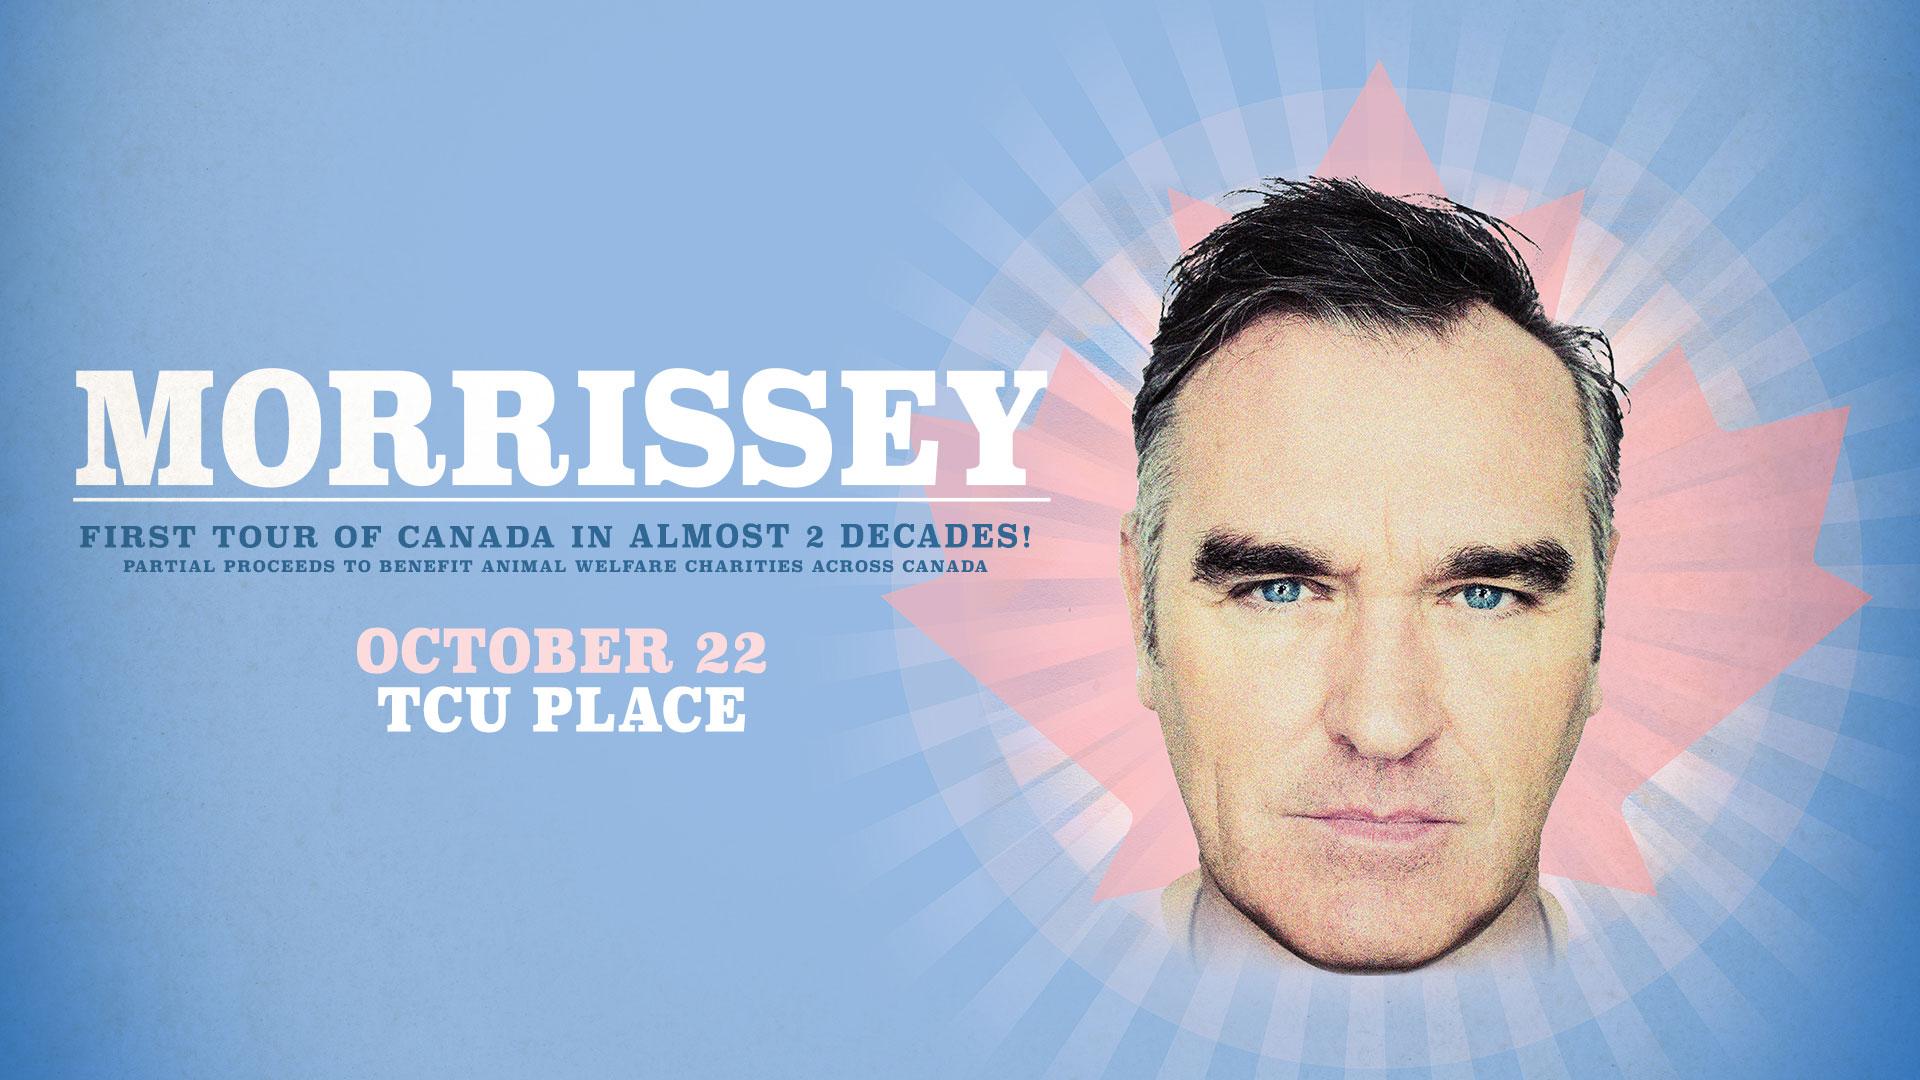 1022-Saskatoon-Morrissey-1920x1080.jpg